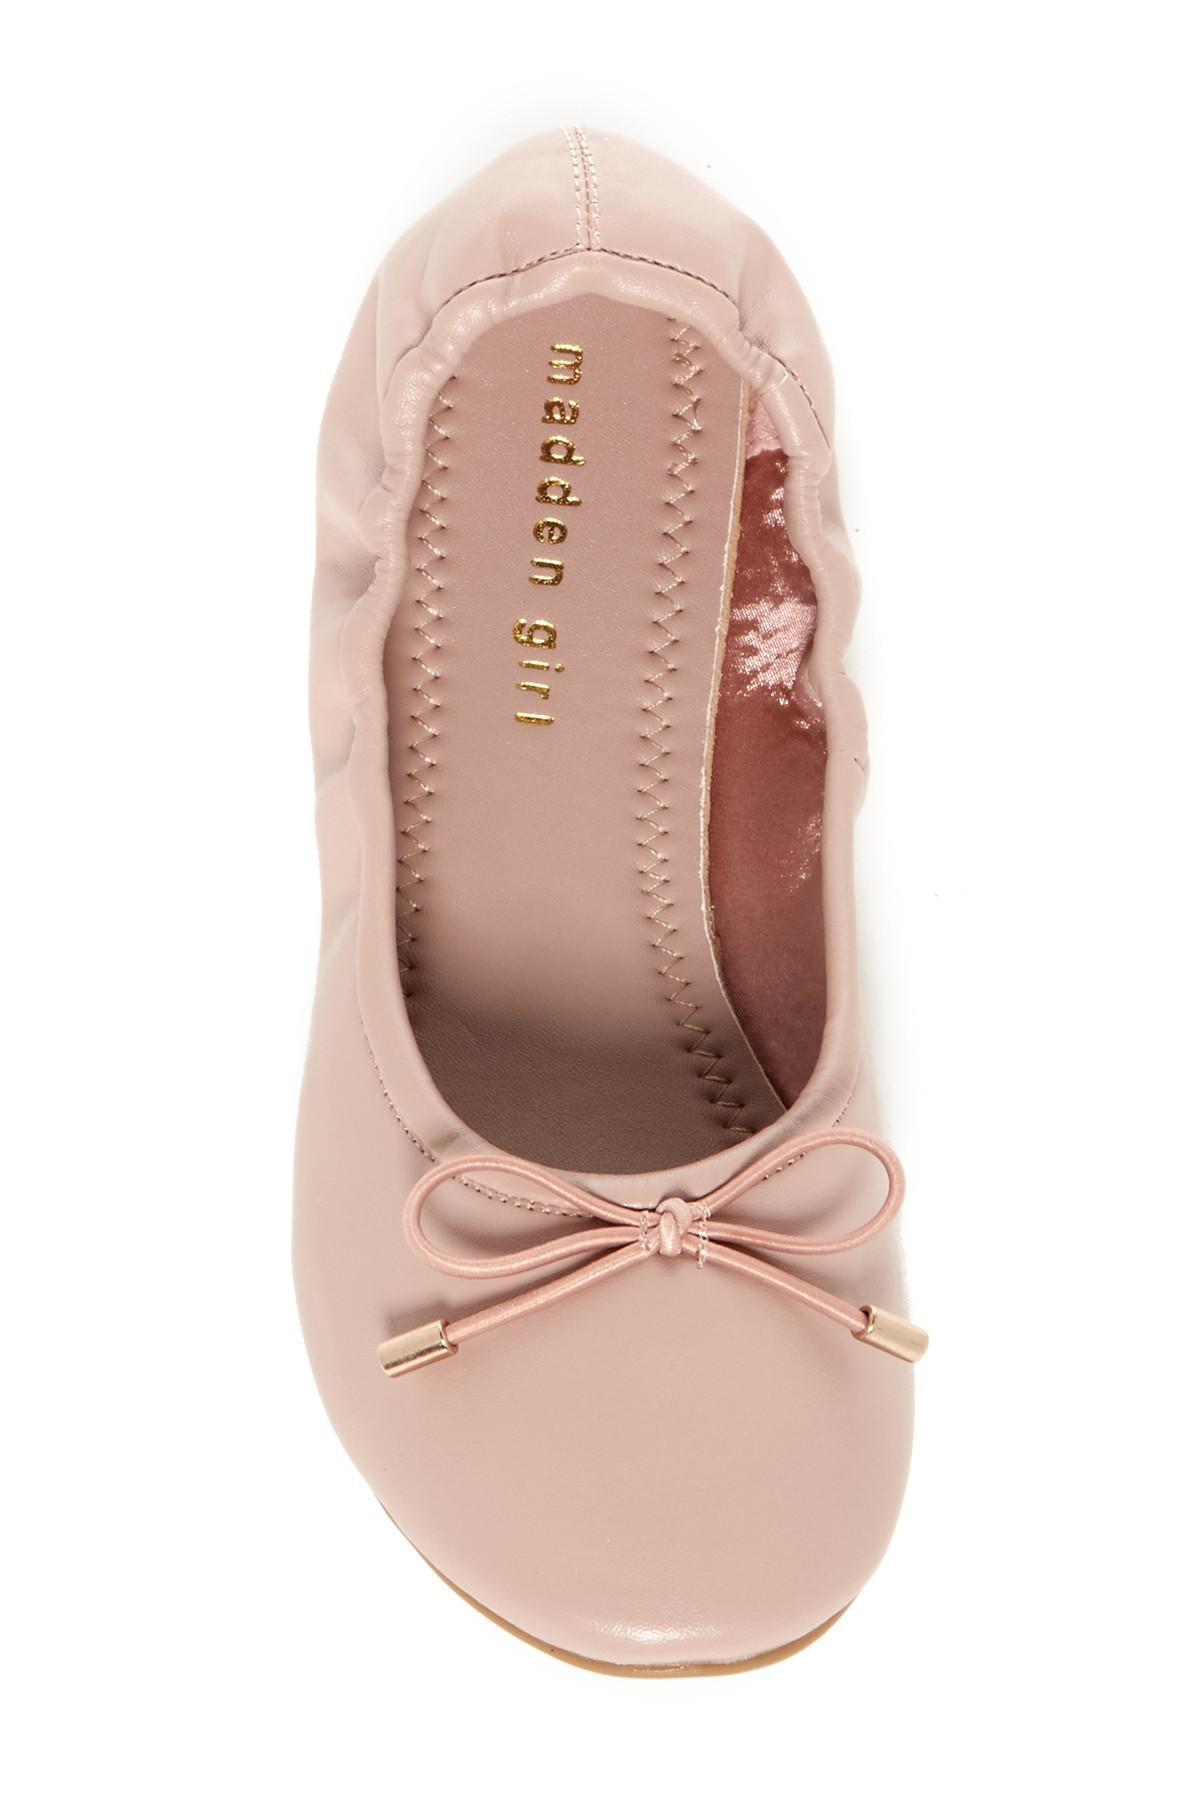 Madden Girl Heidiee Ballerina Flat in